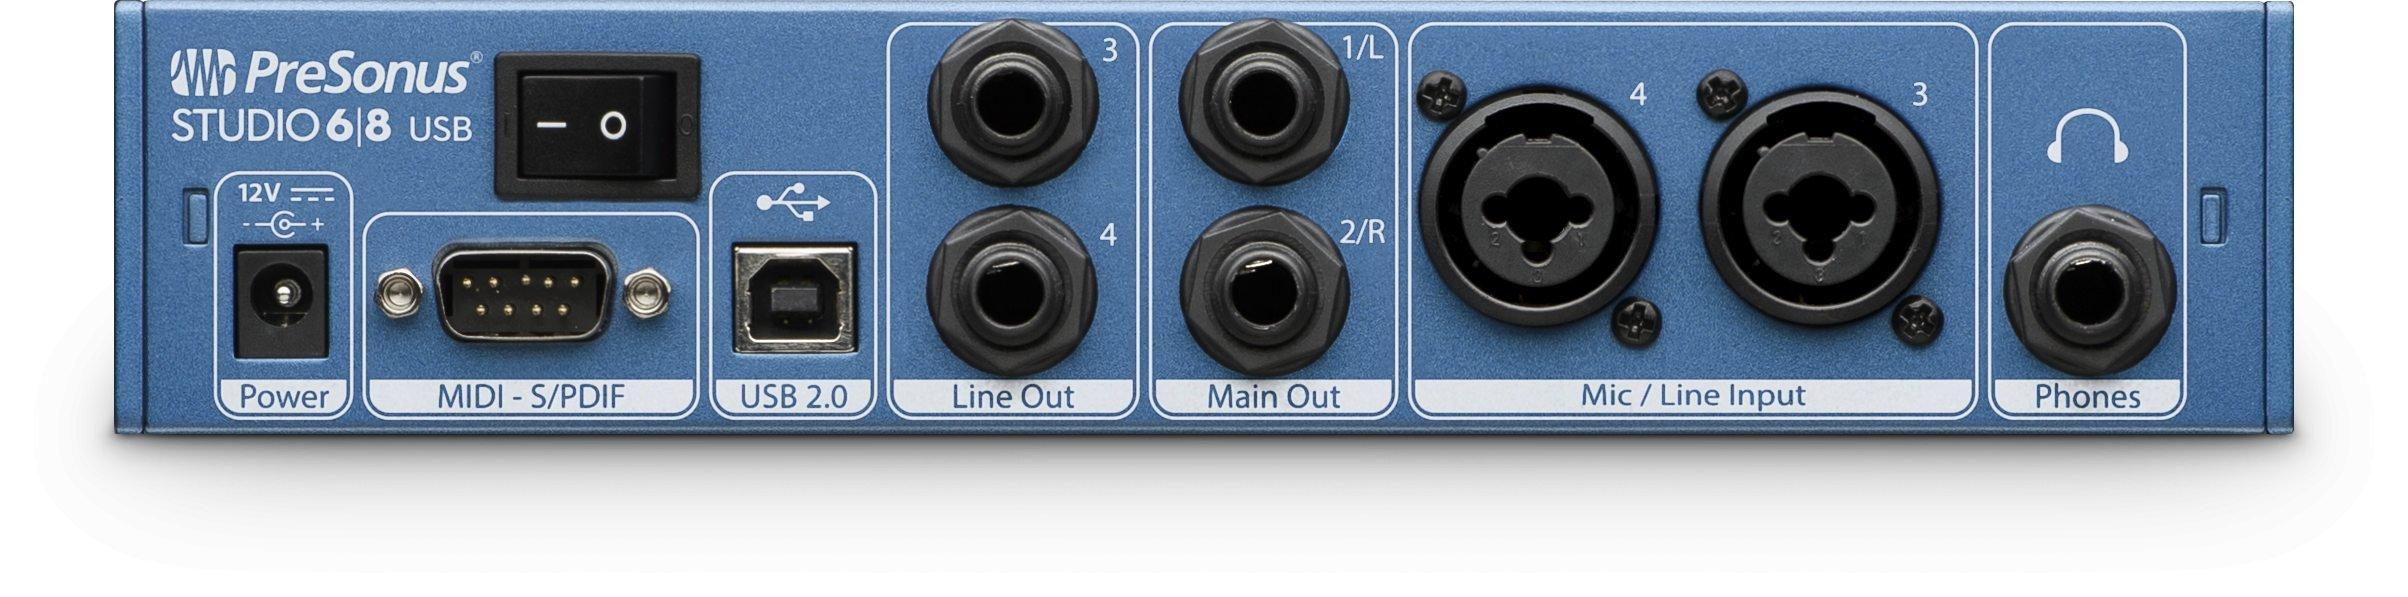 Presonus Studio 68 Audio Interface with AKG K240 Studio Headphones by PreSonus (Image #3)